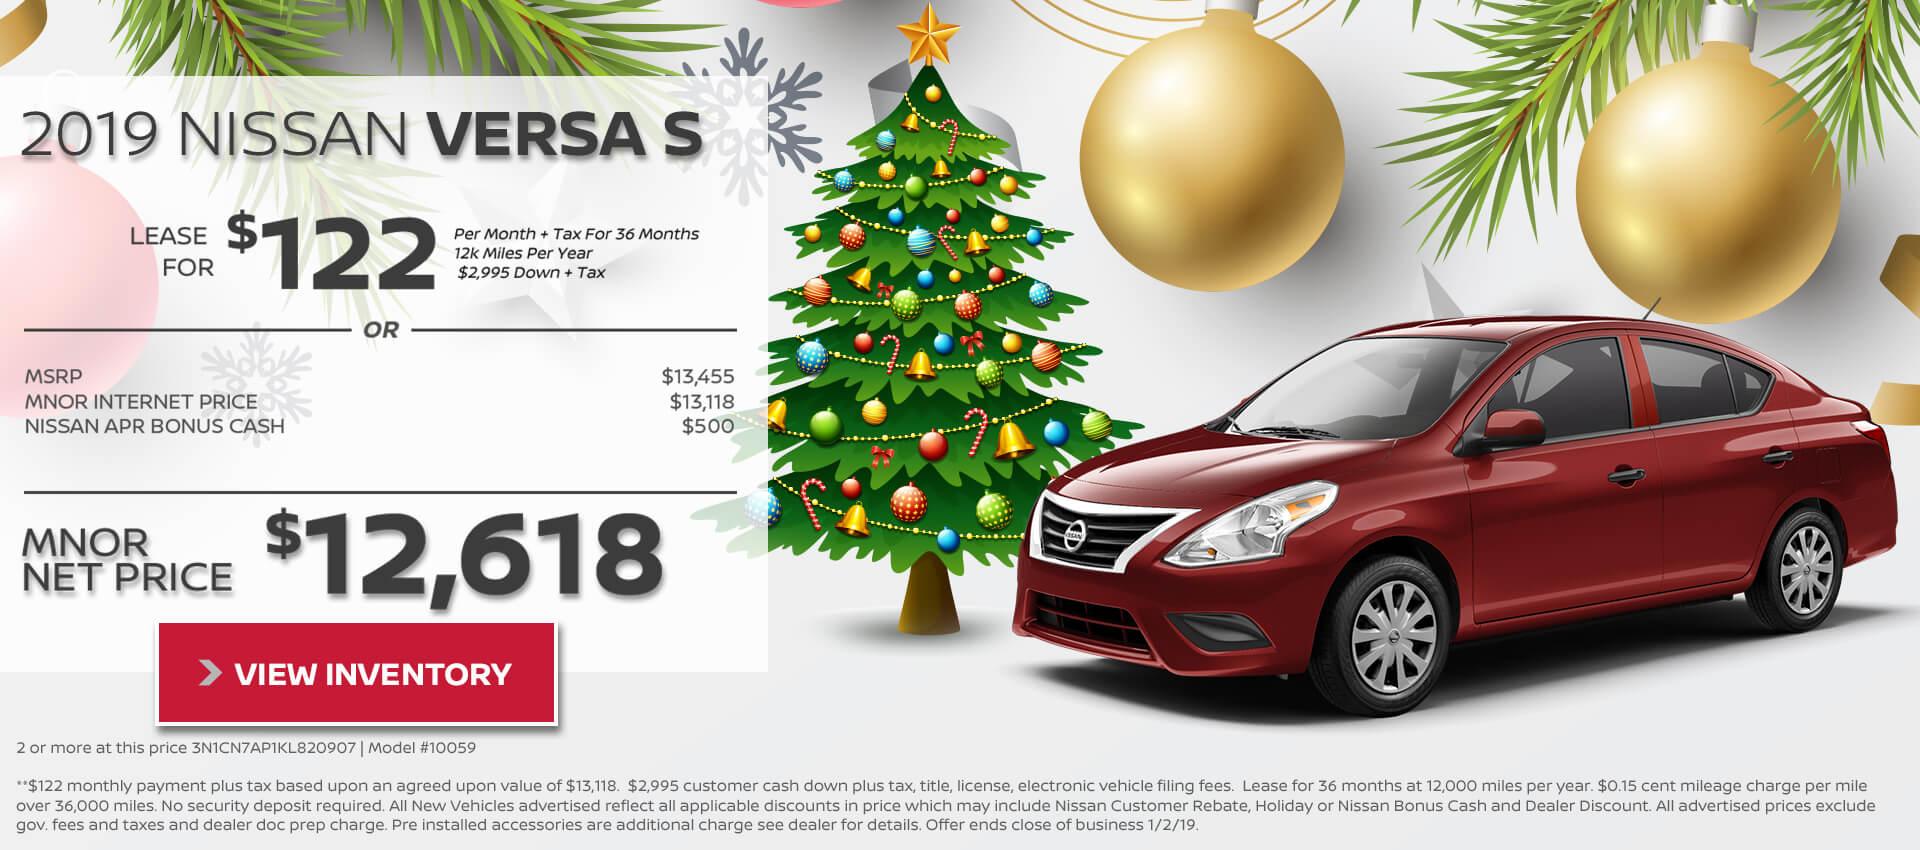 2018 Nissan Versa Sedan $12,618